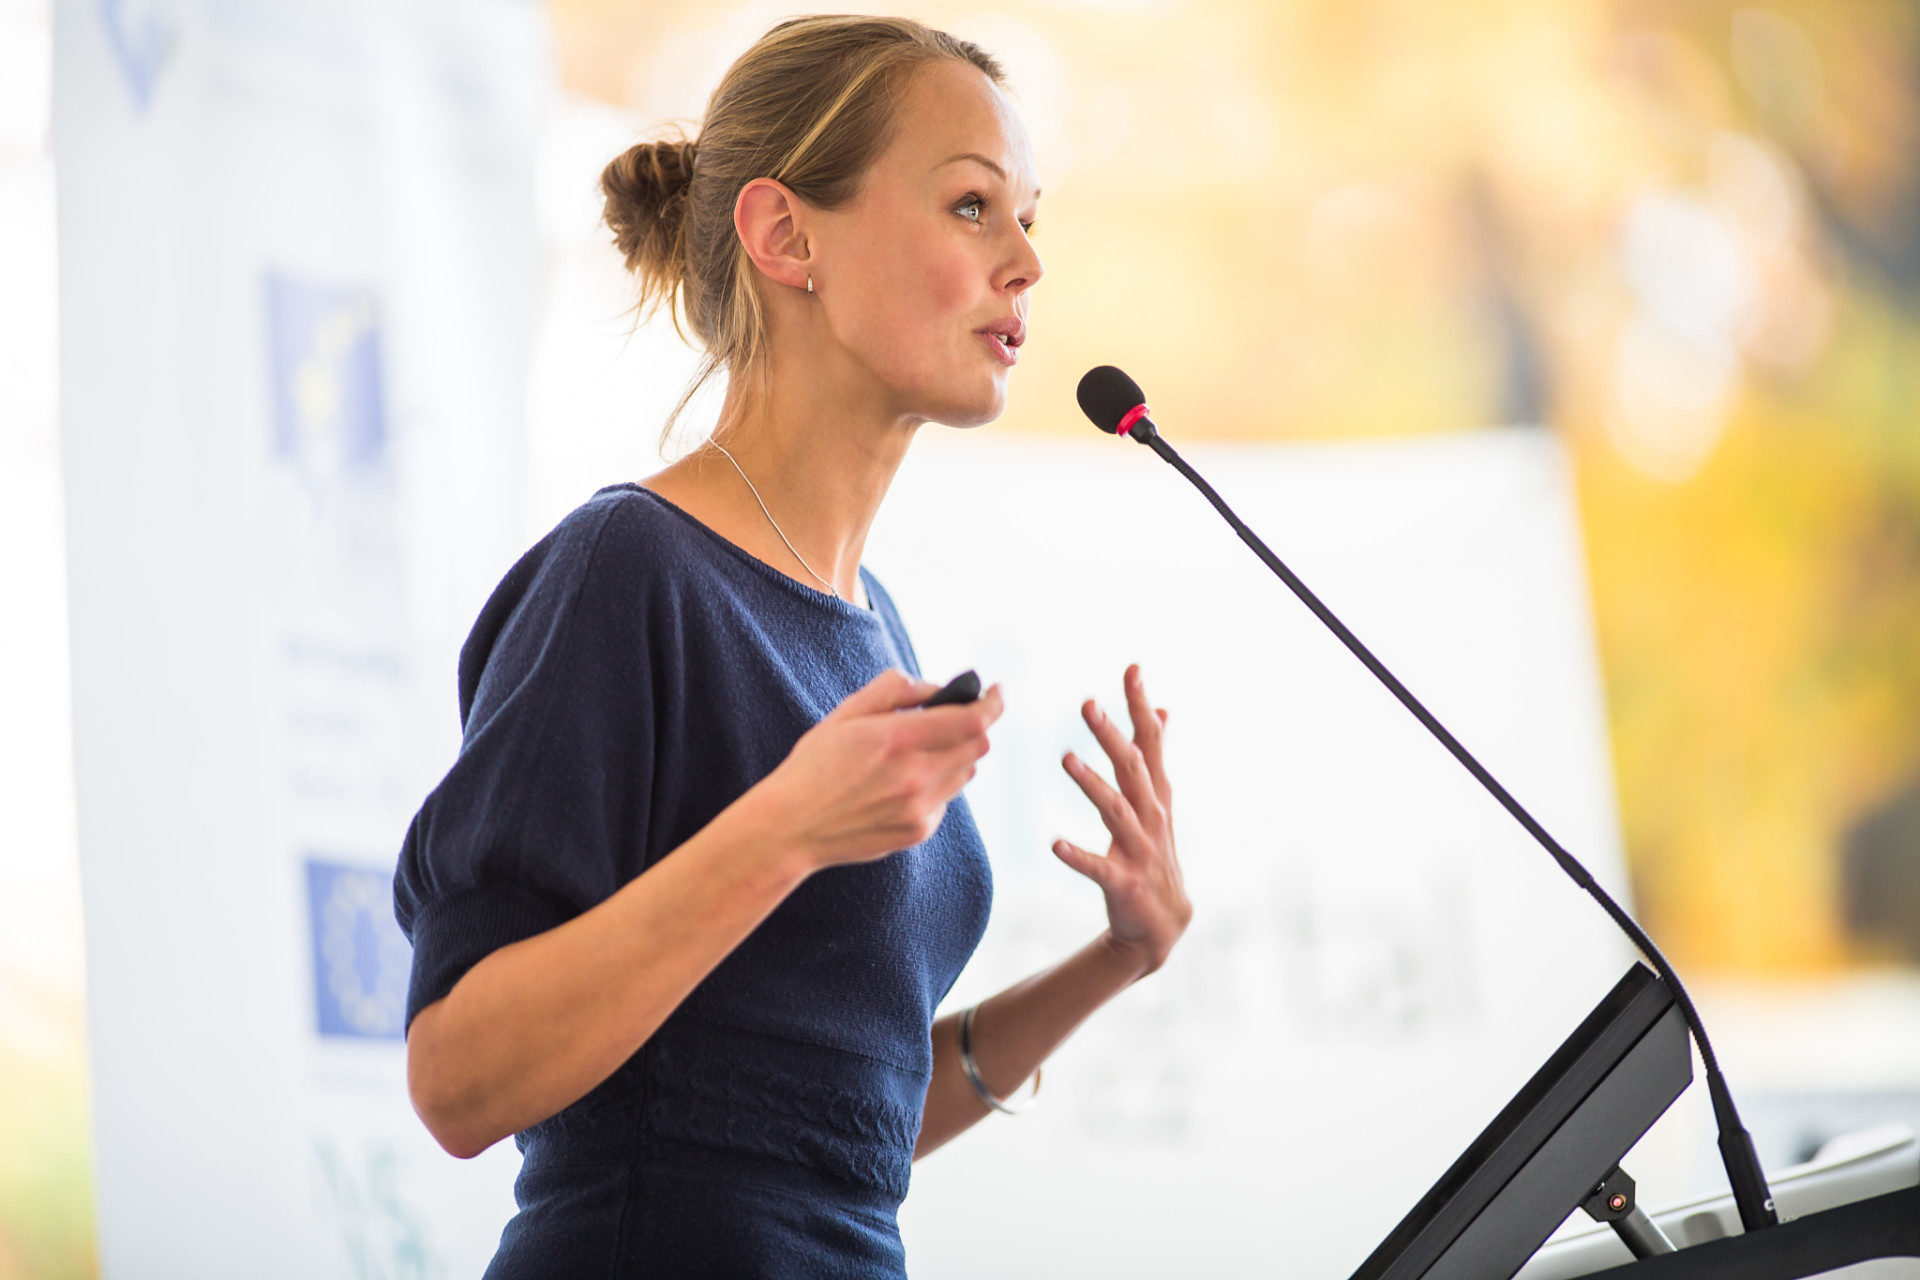 mujer-pitch-open-talent-publico-discurso-evento-bbva_opt (1)